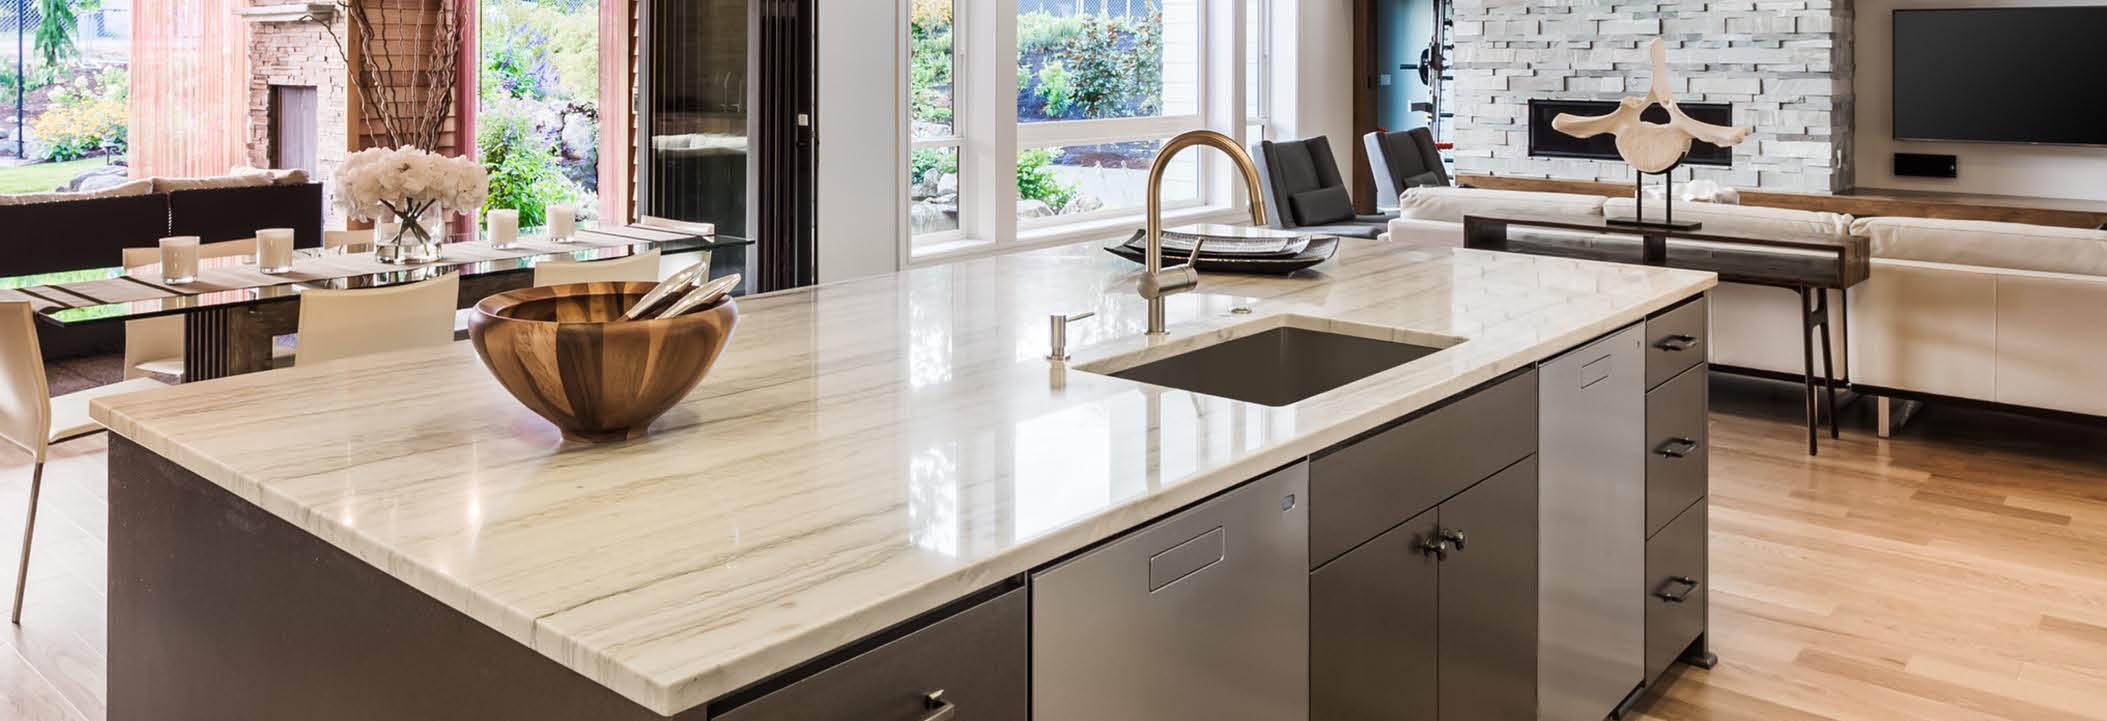 kitchen remodel san diego P H D Home Improvement Inc Banner Ad San Diego CA